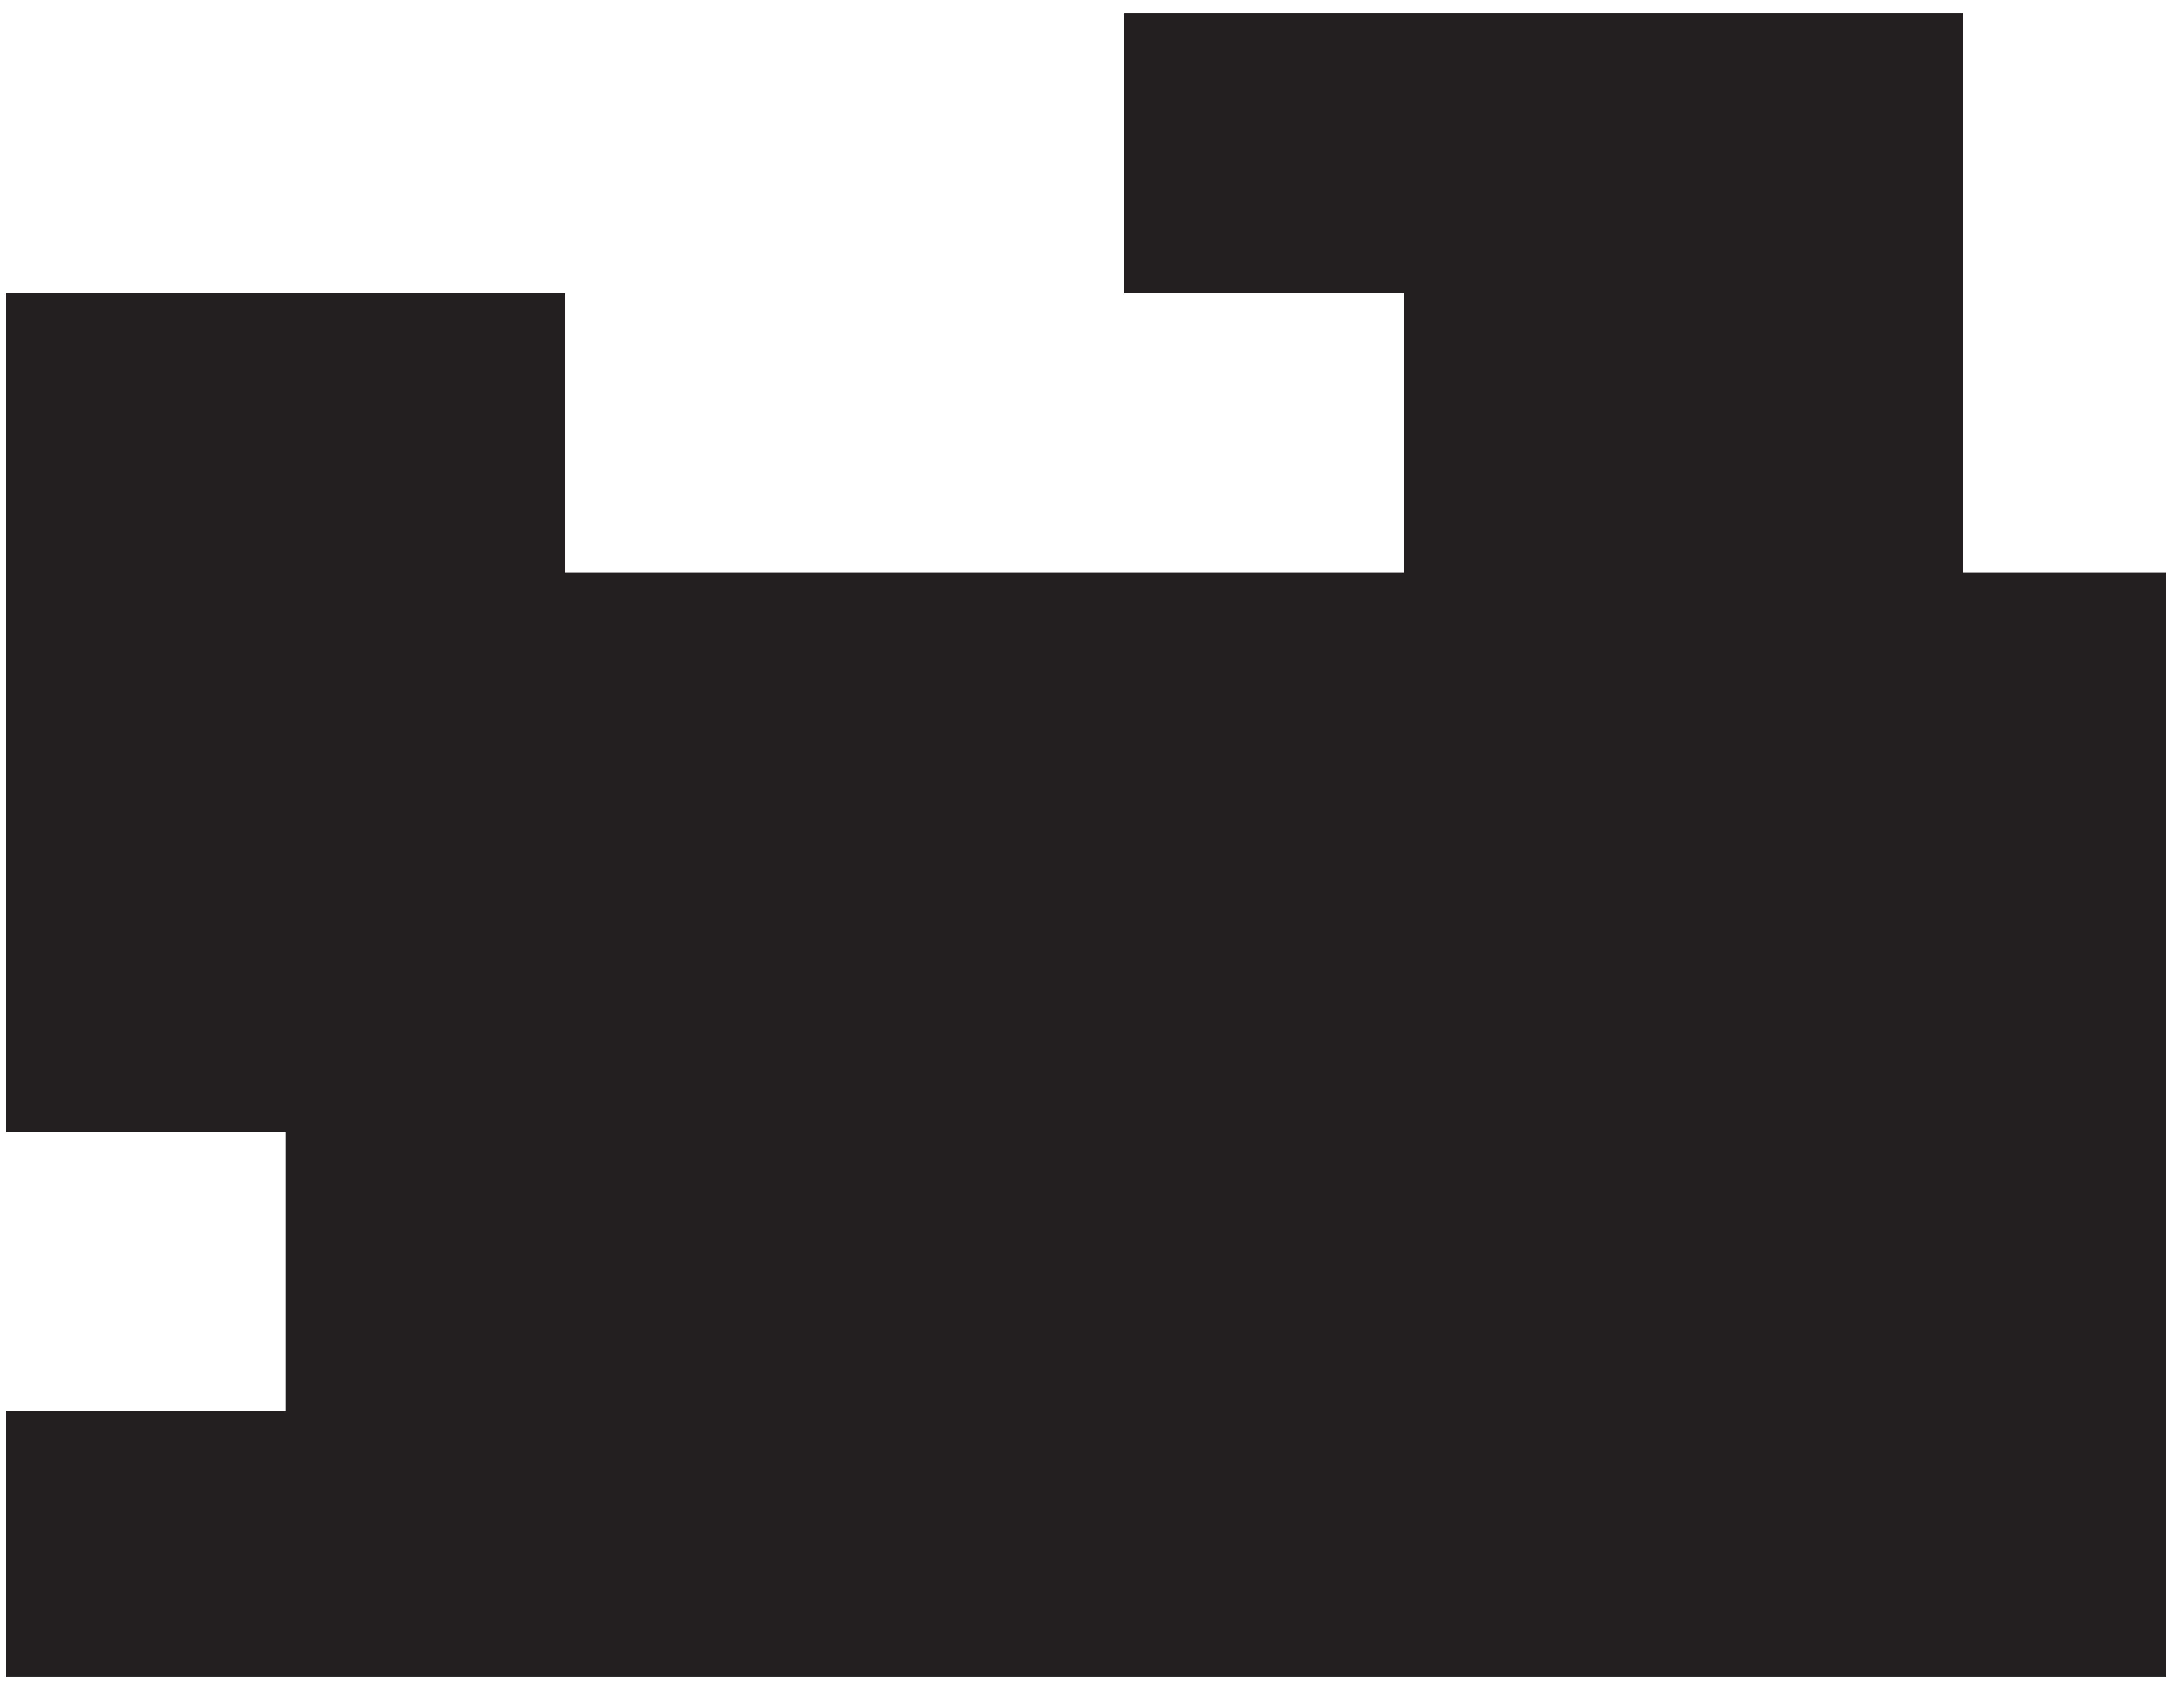 8000x6190 Kitten Black Cat Silhouette